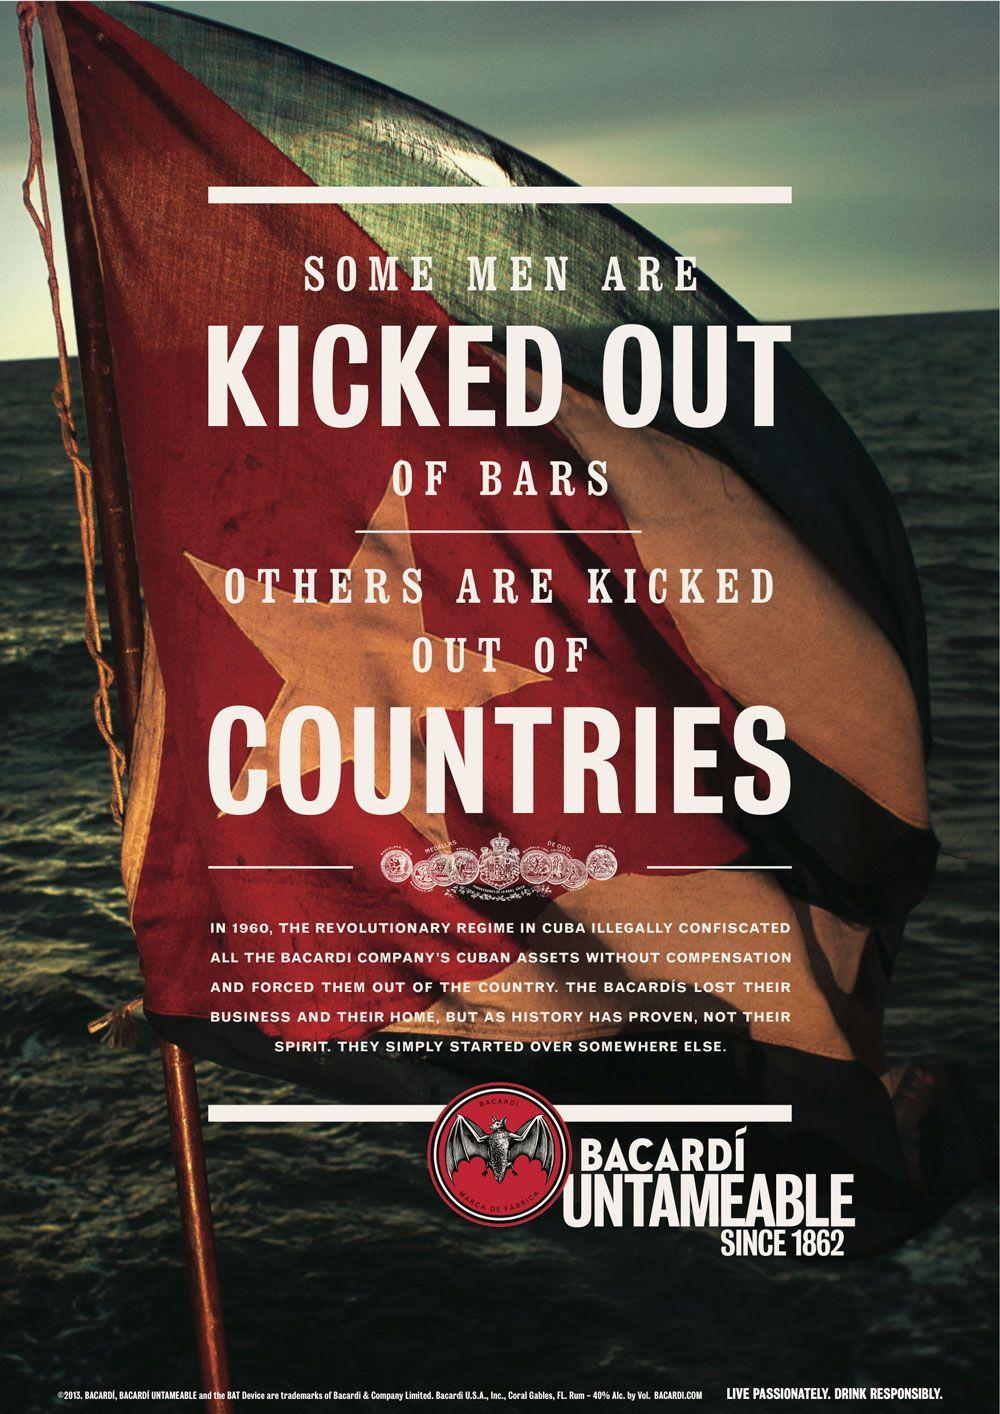 Bacardi Camp King Bacardi Bacardi Rum Print Ads